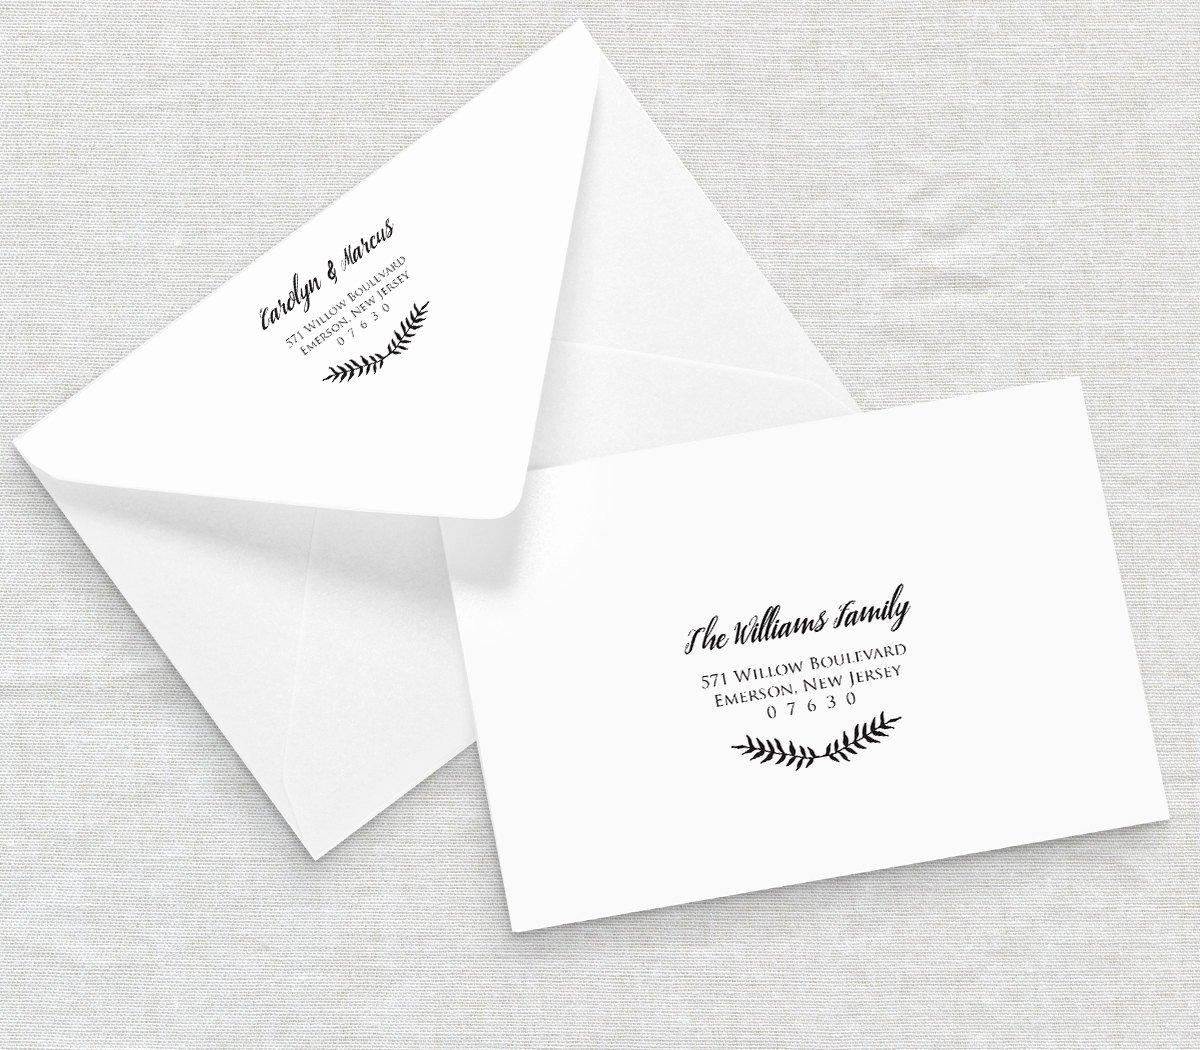 Wedding Envelope Printing Template Fresh Envelope Template Printable Wedding Calligraphy Address